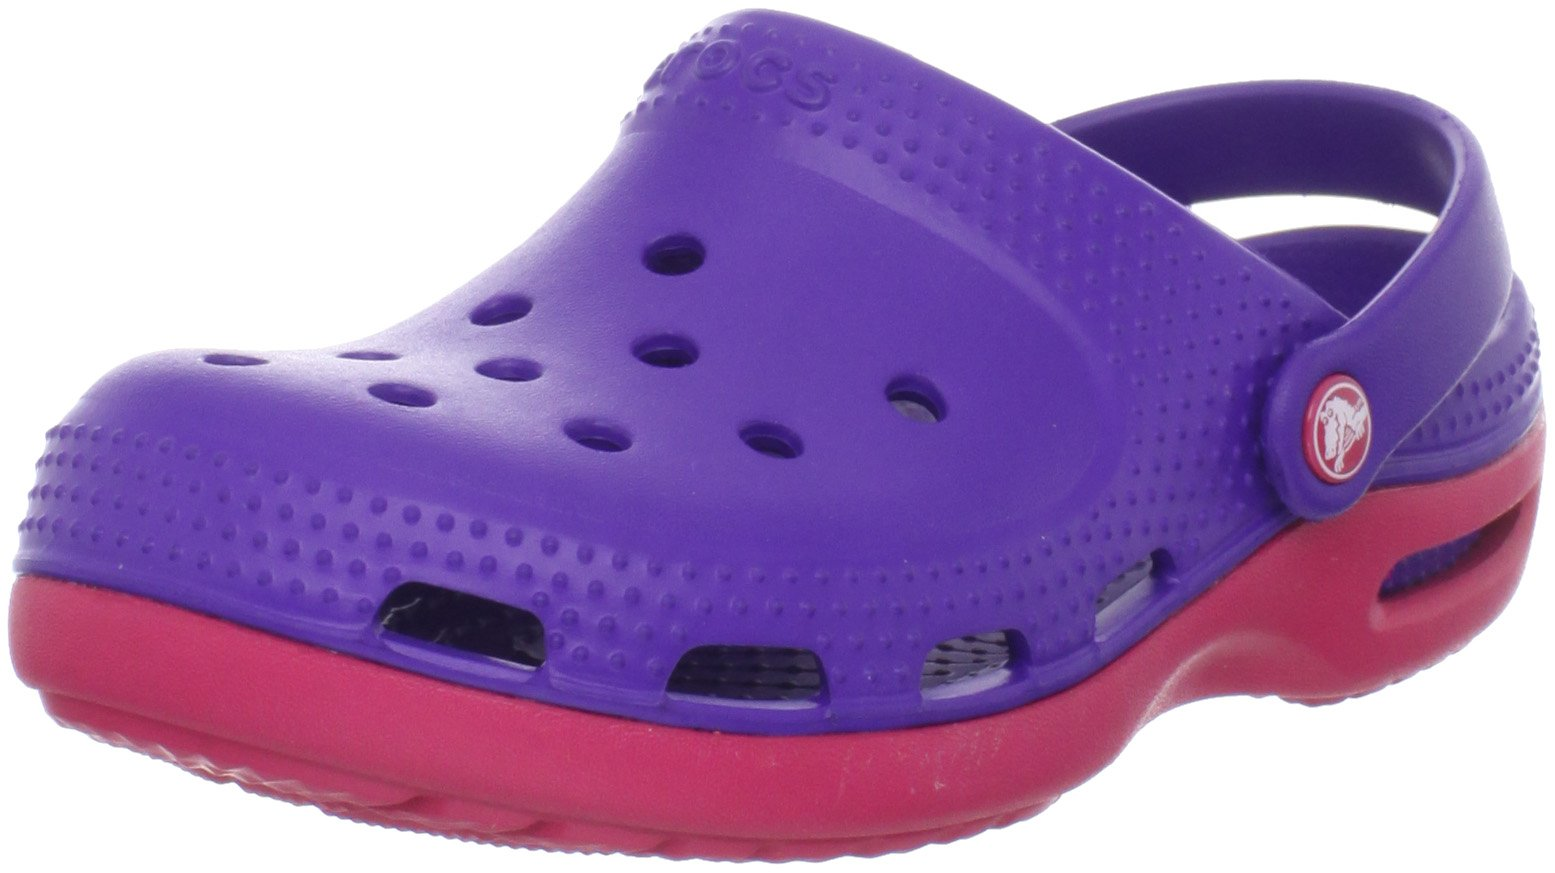 Crocs Duet Plus Mule (Toddler/Little Kid),Ultra Violet/Raspberry,2 M US Little Kid/ 4 M US Women's